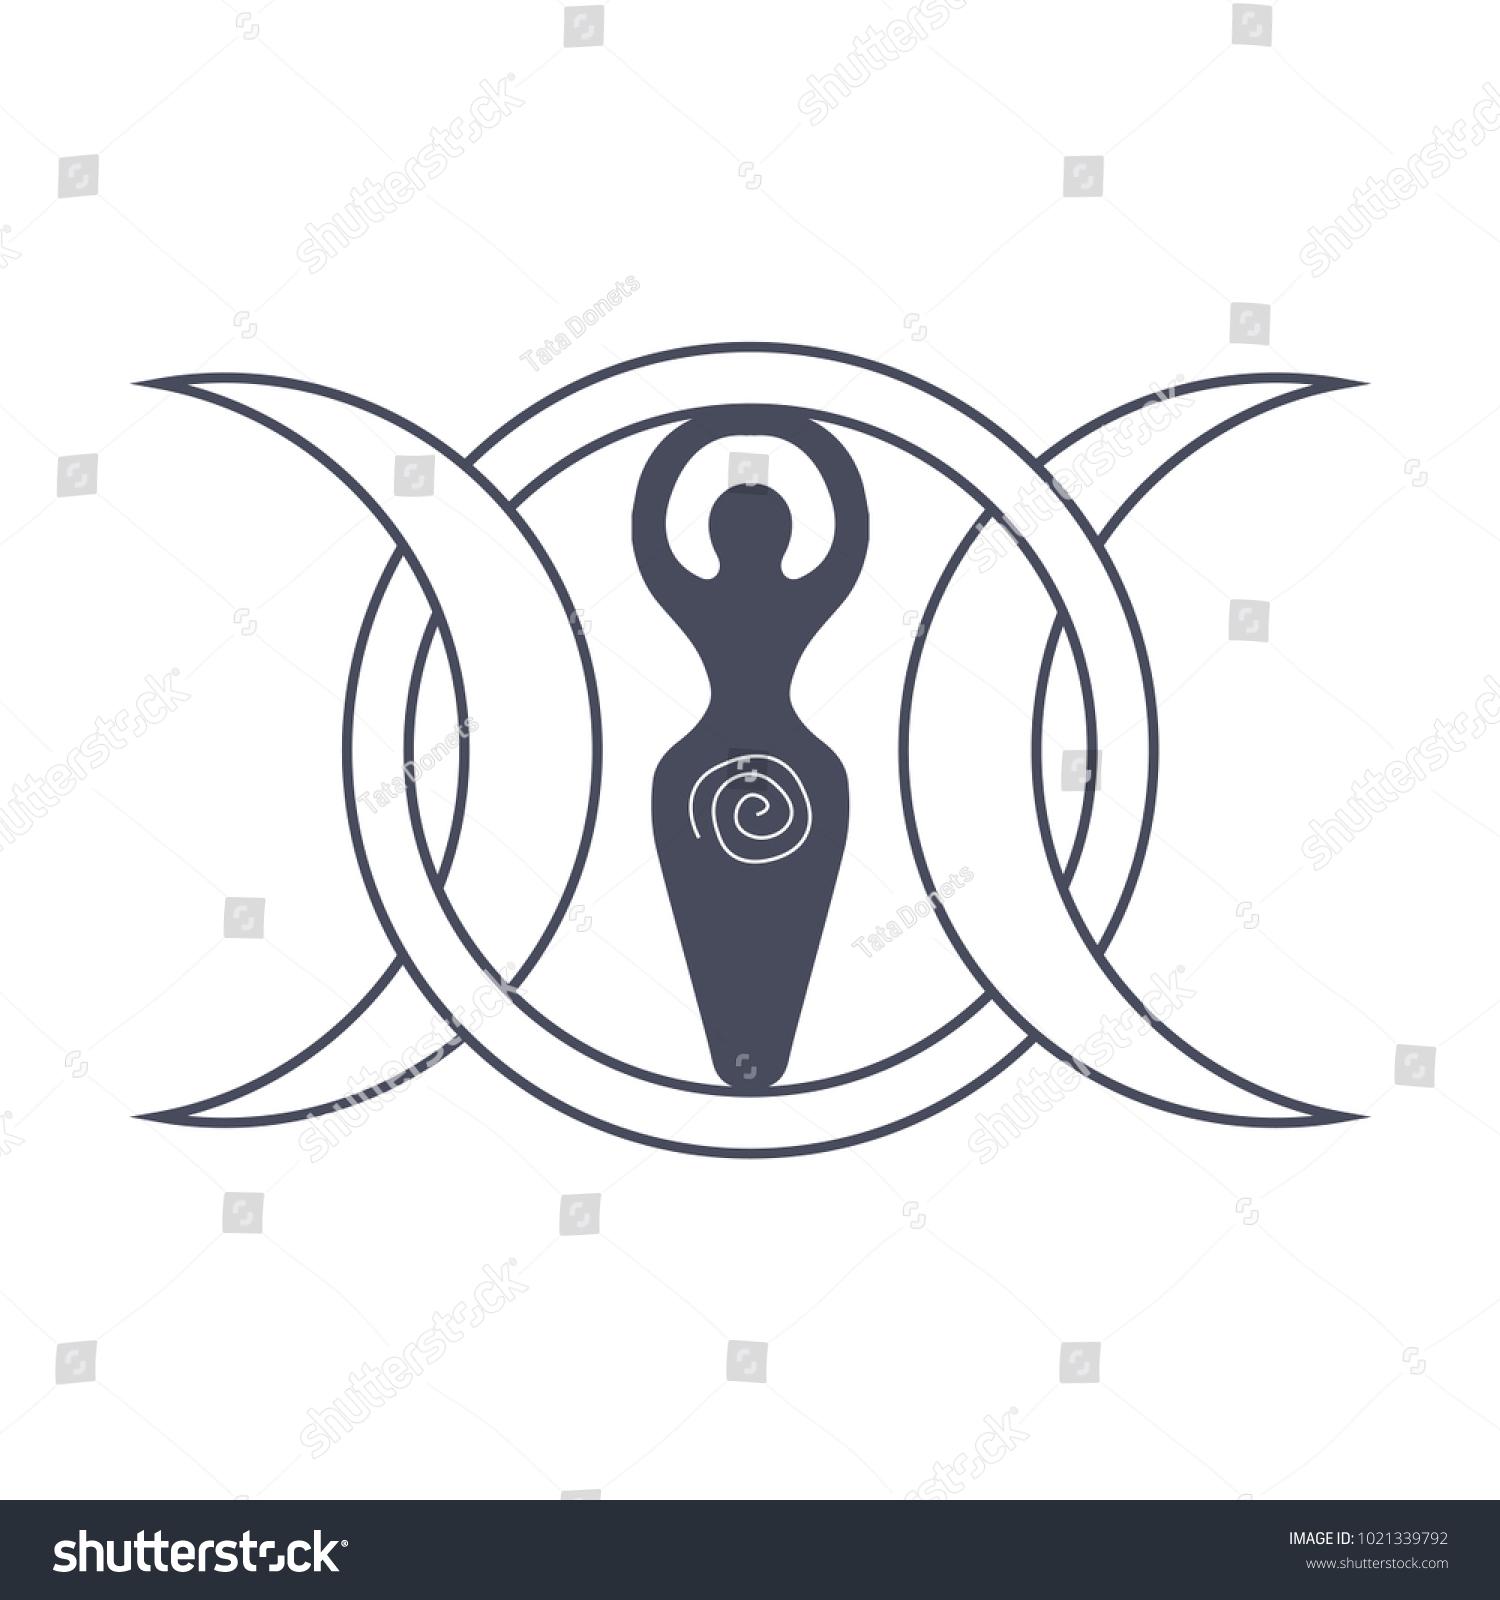 Vector Illustration Wiccan Community Spiral Goddess Stock Vector